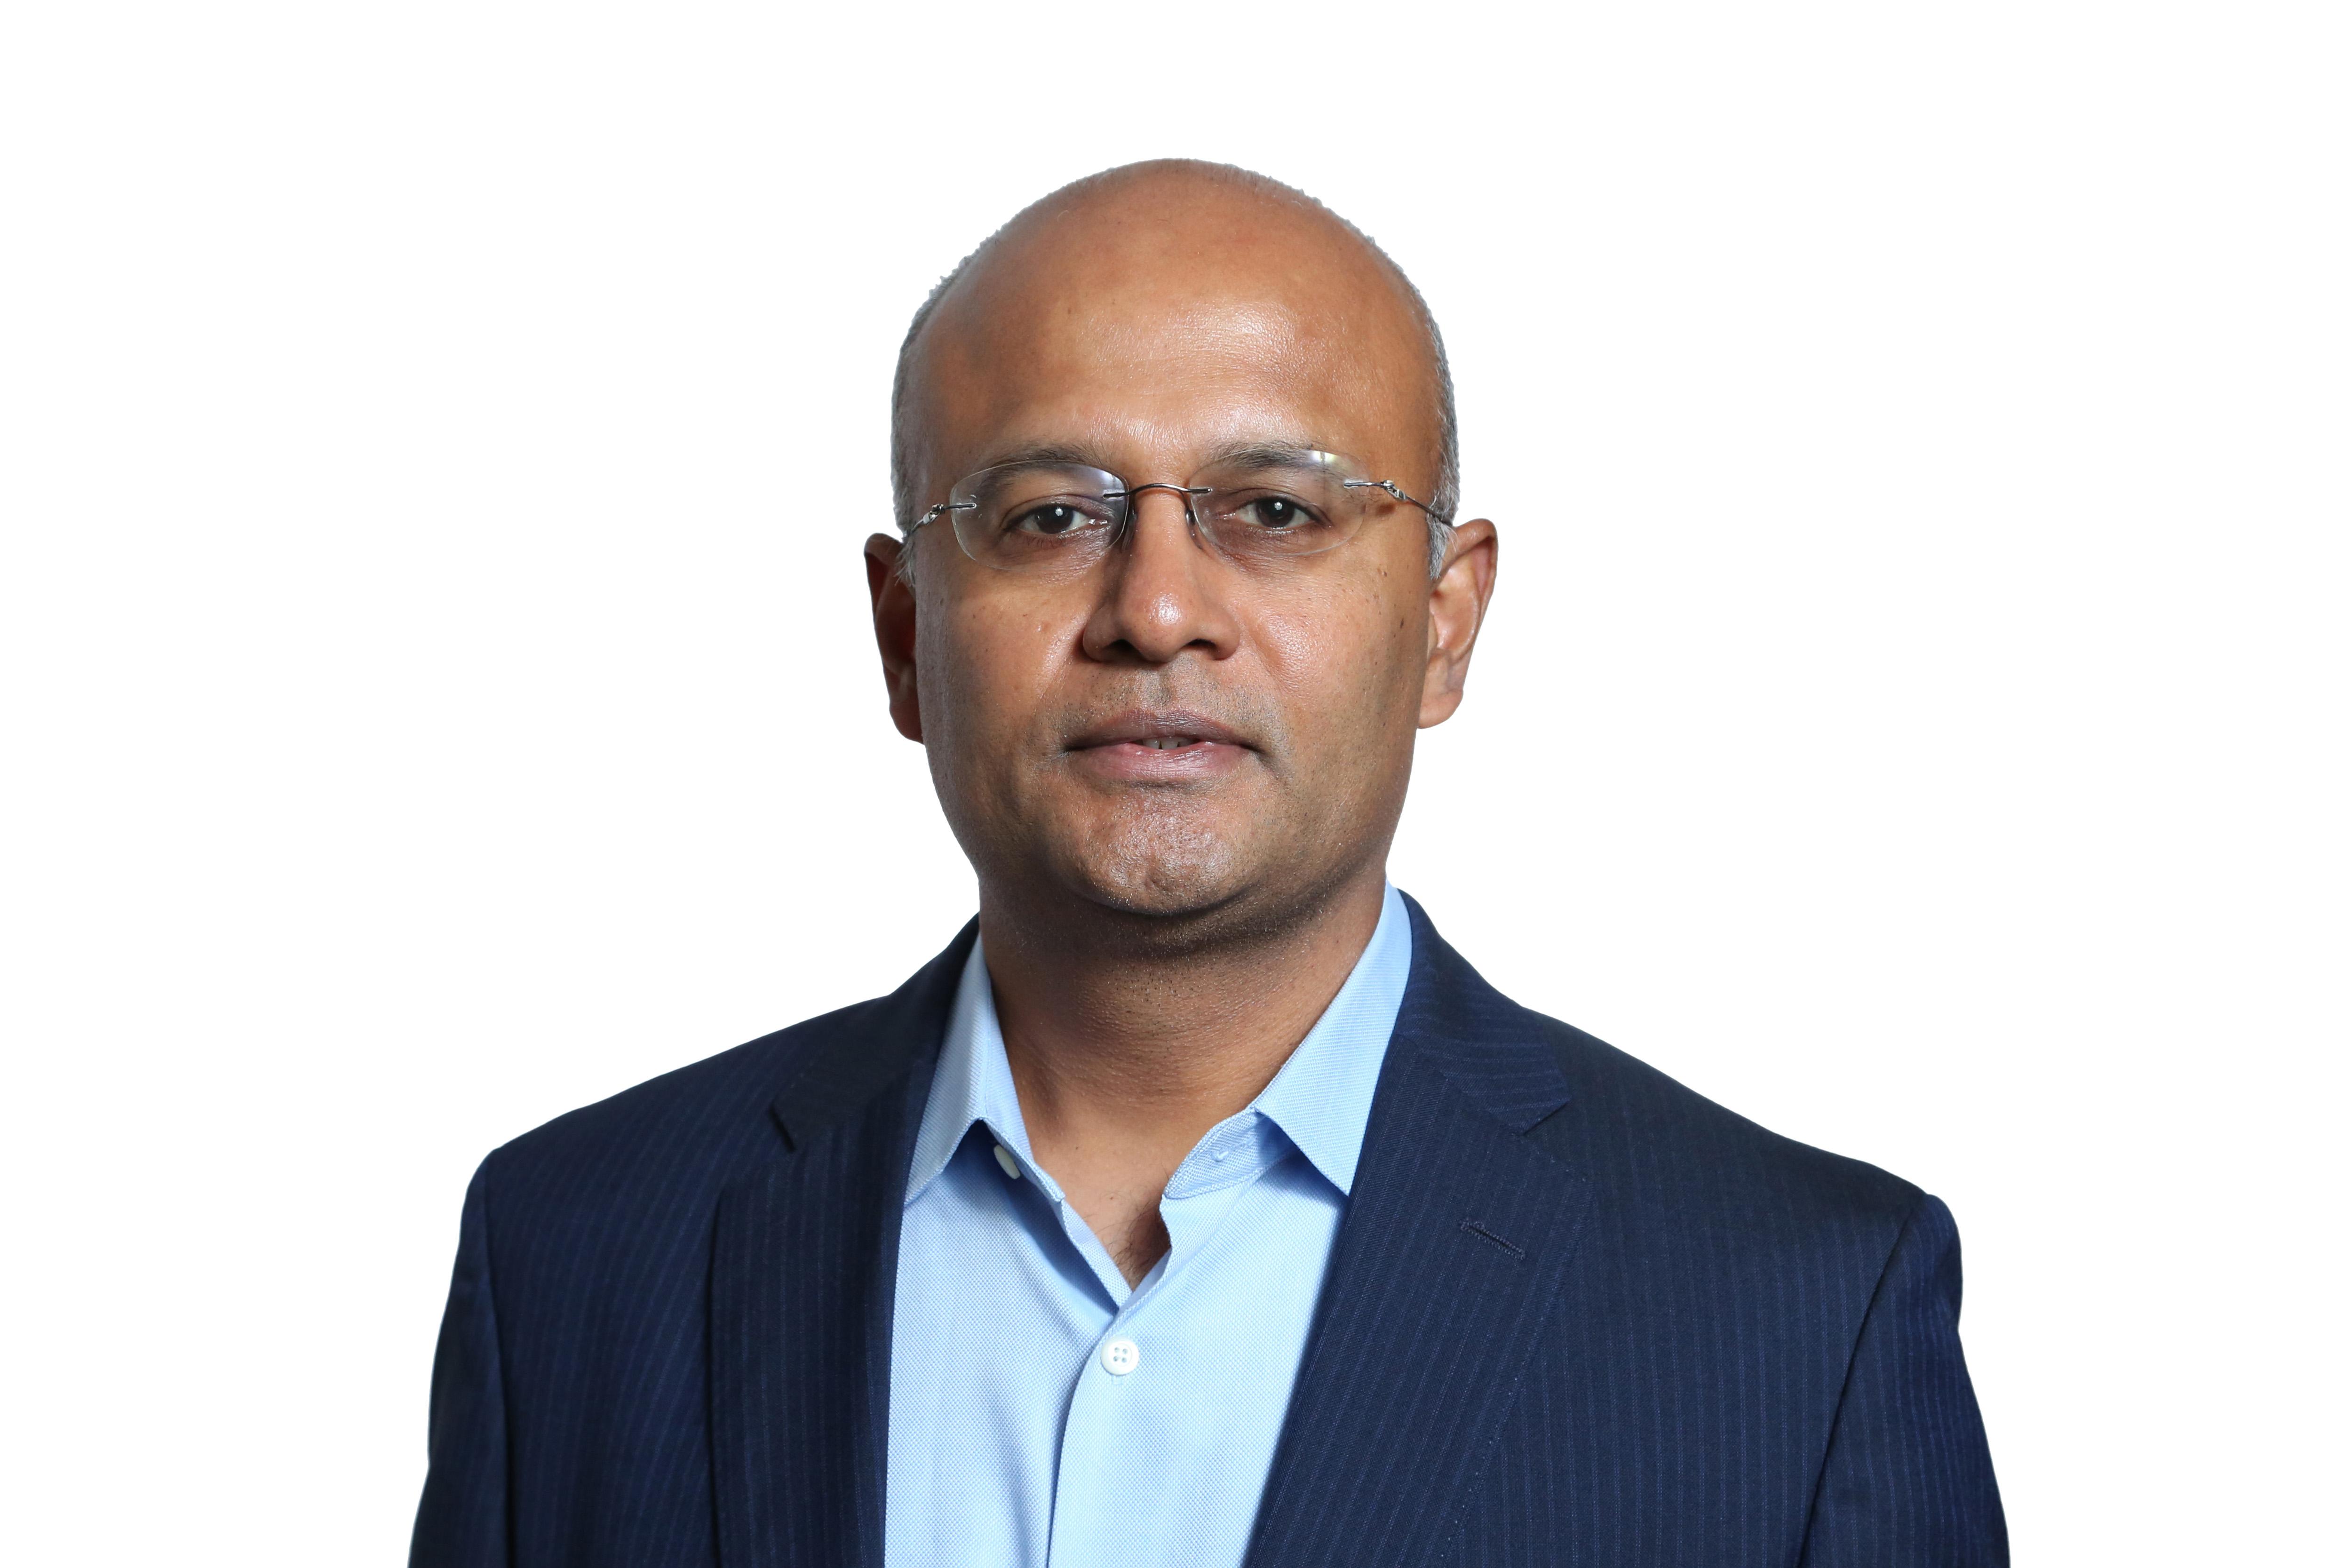 Rajesh Kandaswamy